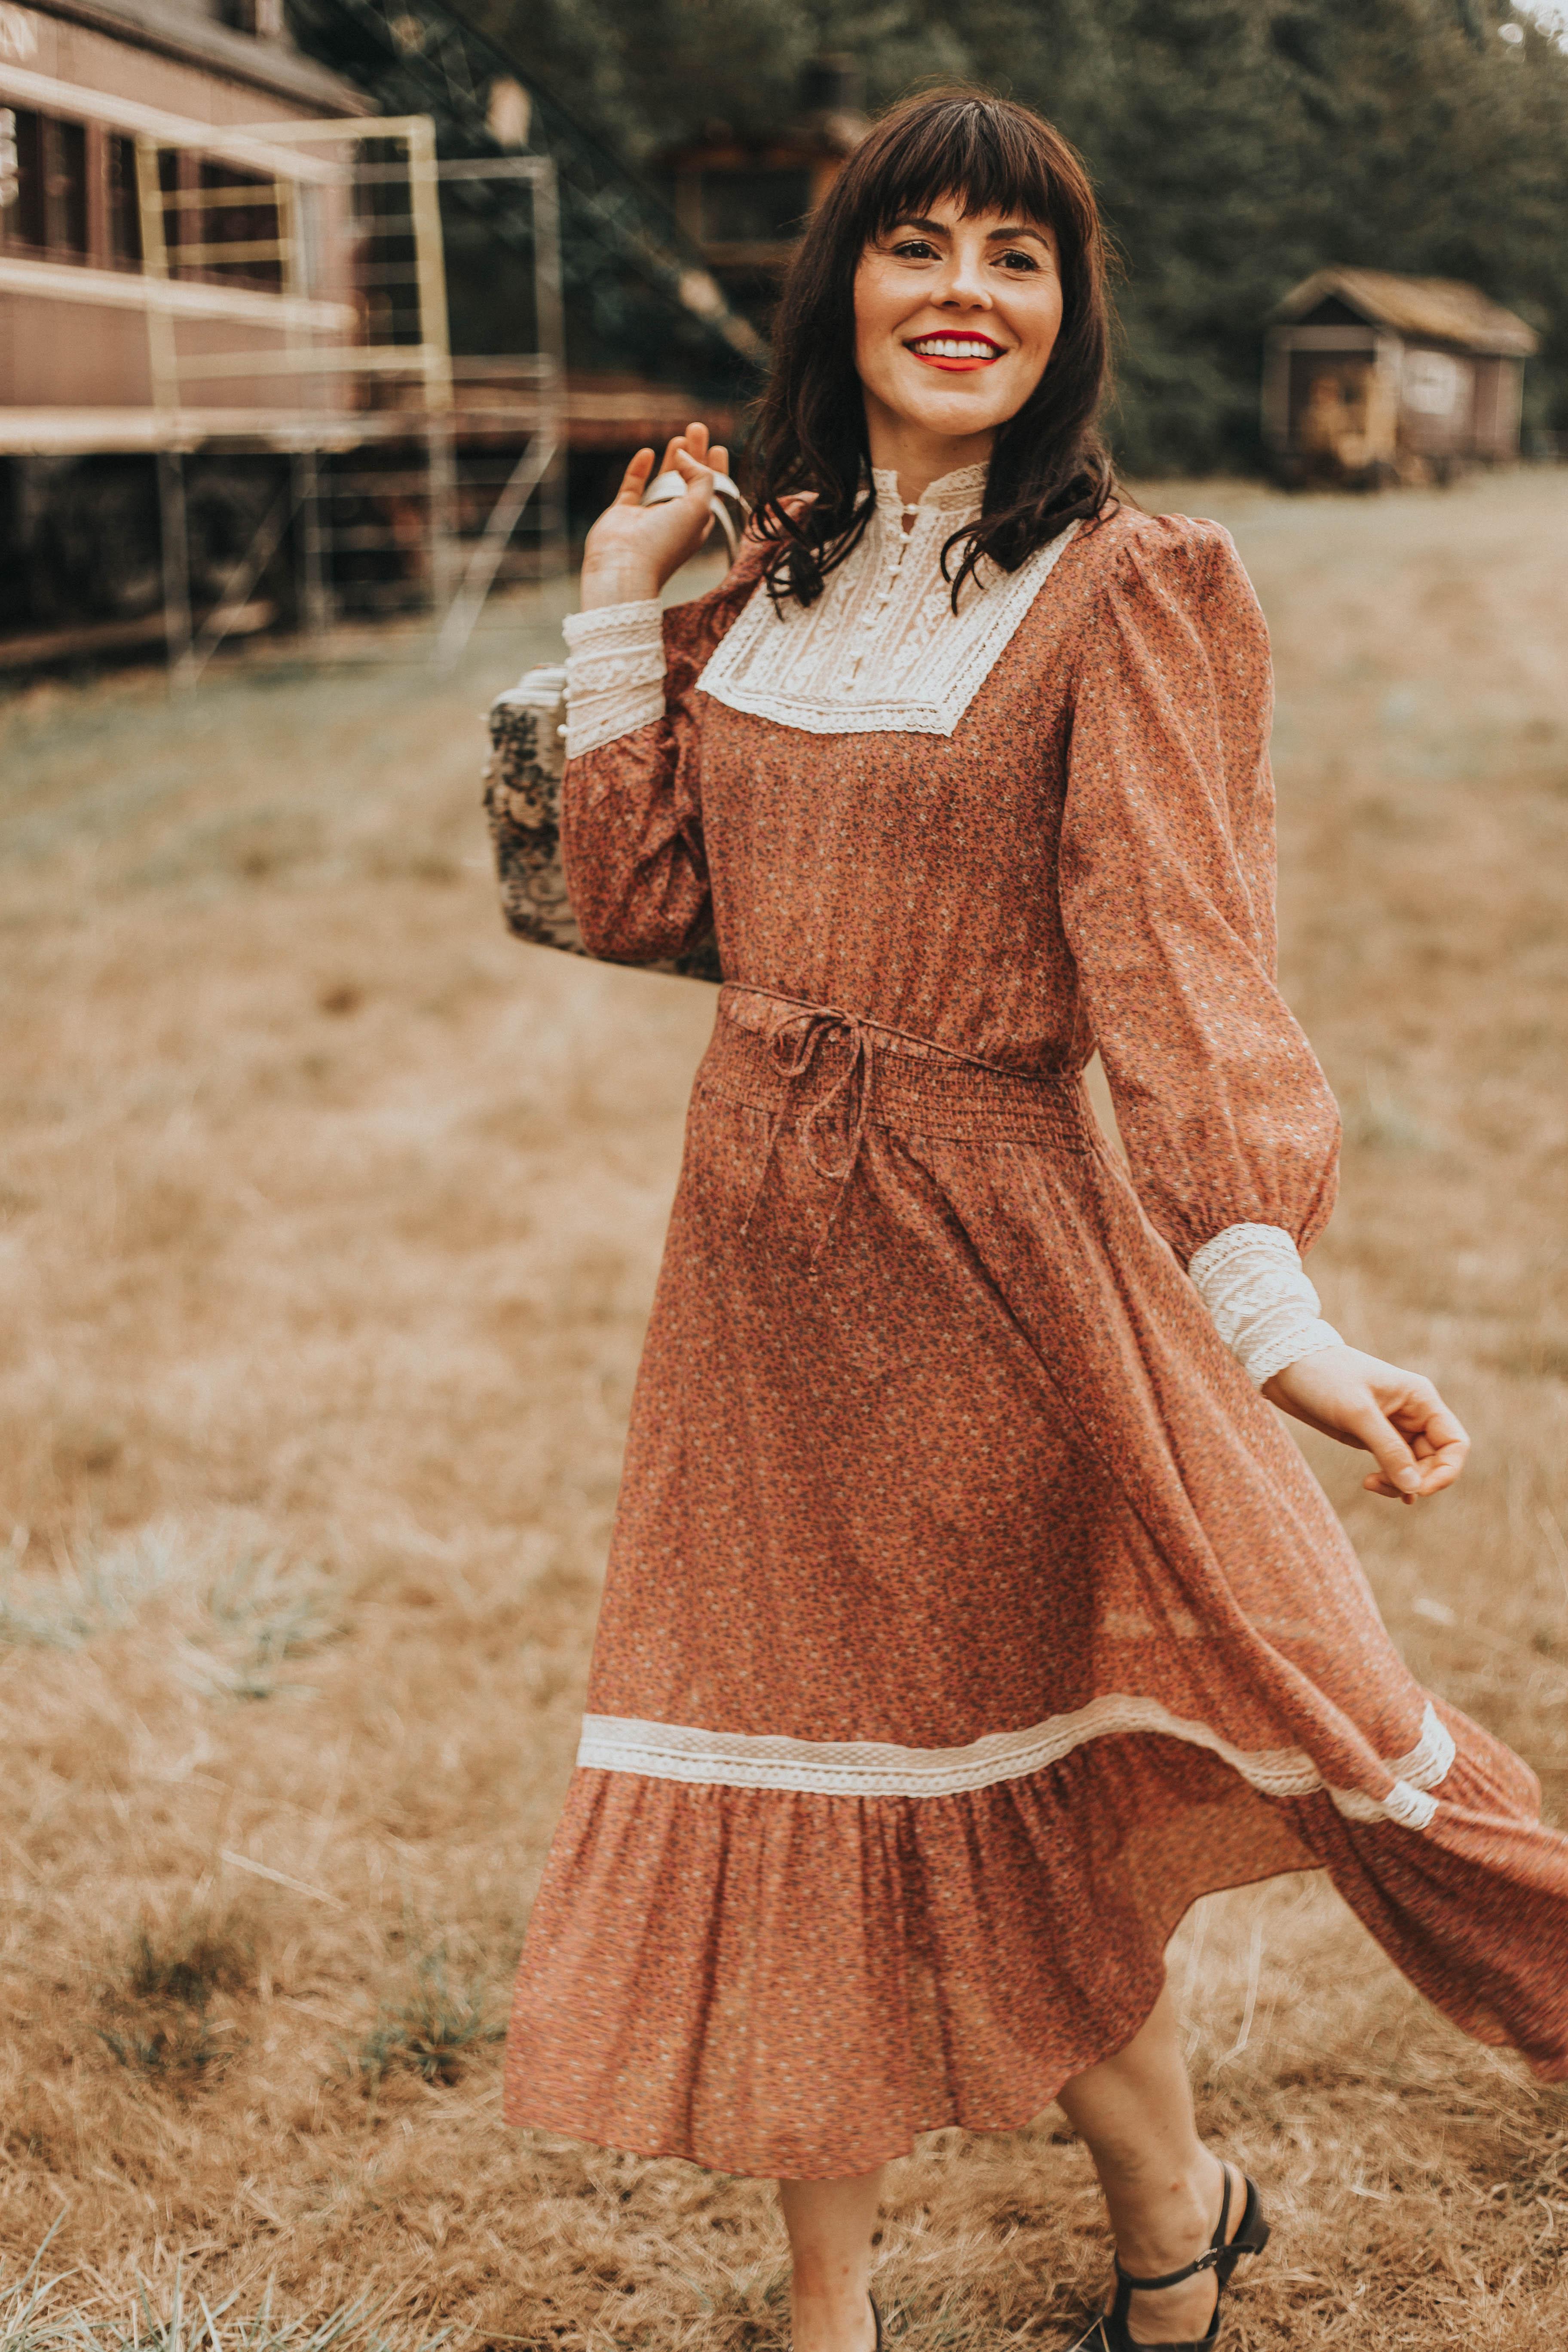 Vintage 1970s boho fall fashion lookbook for women